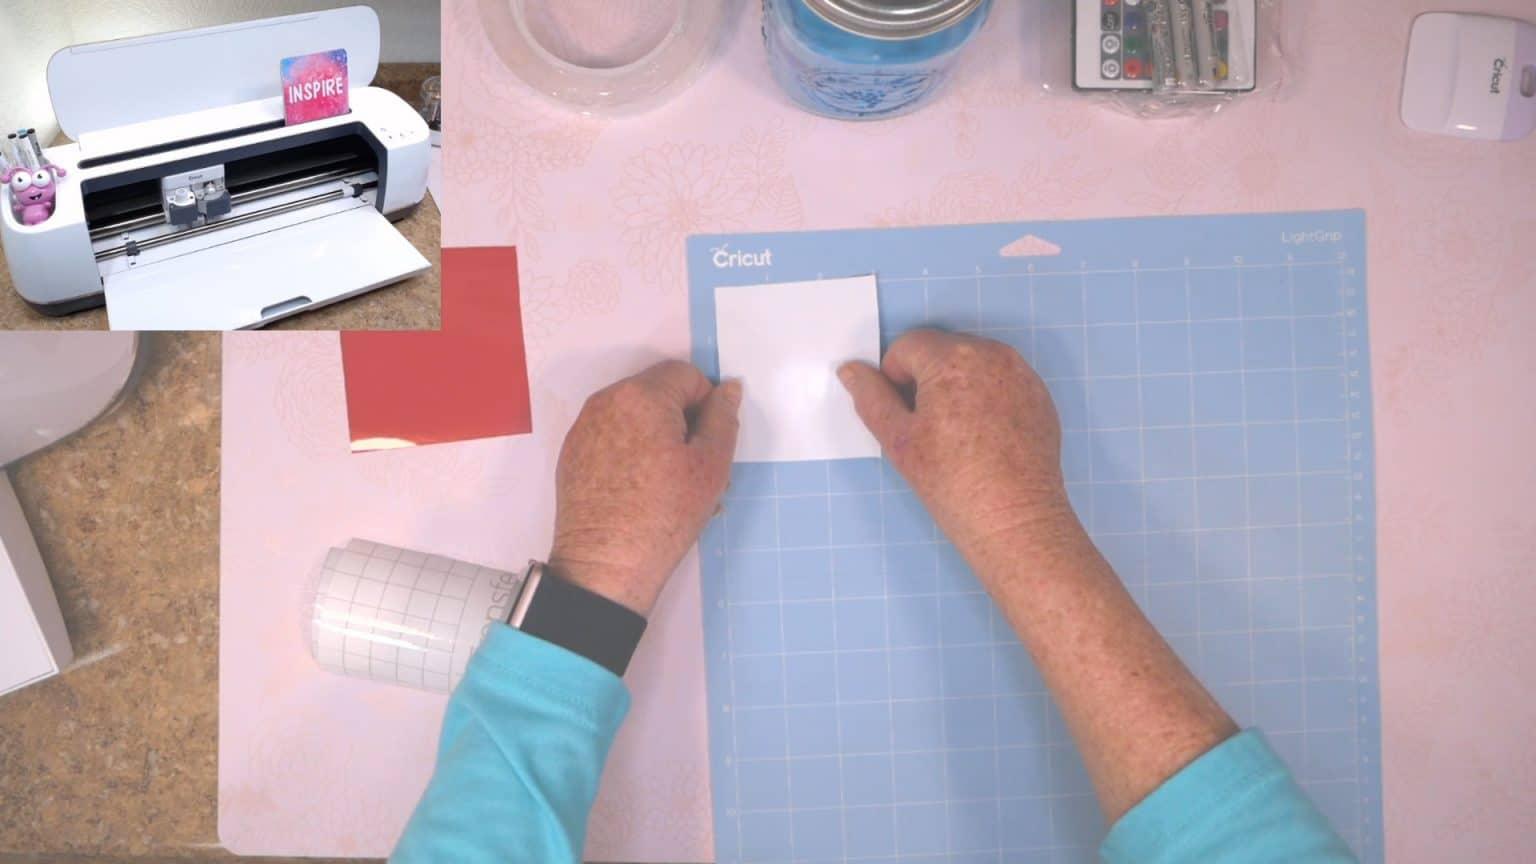 placing vinyl on blue cricut cutting mat